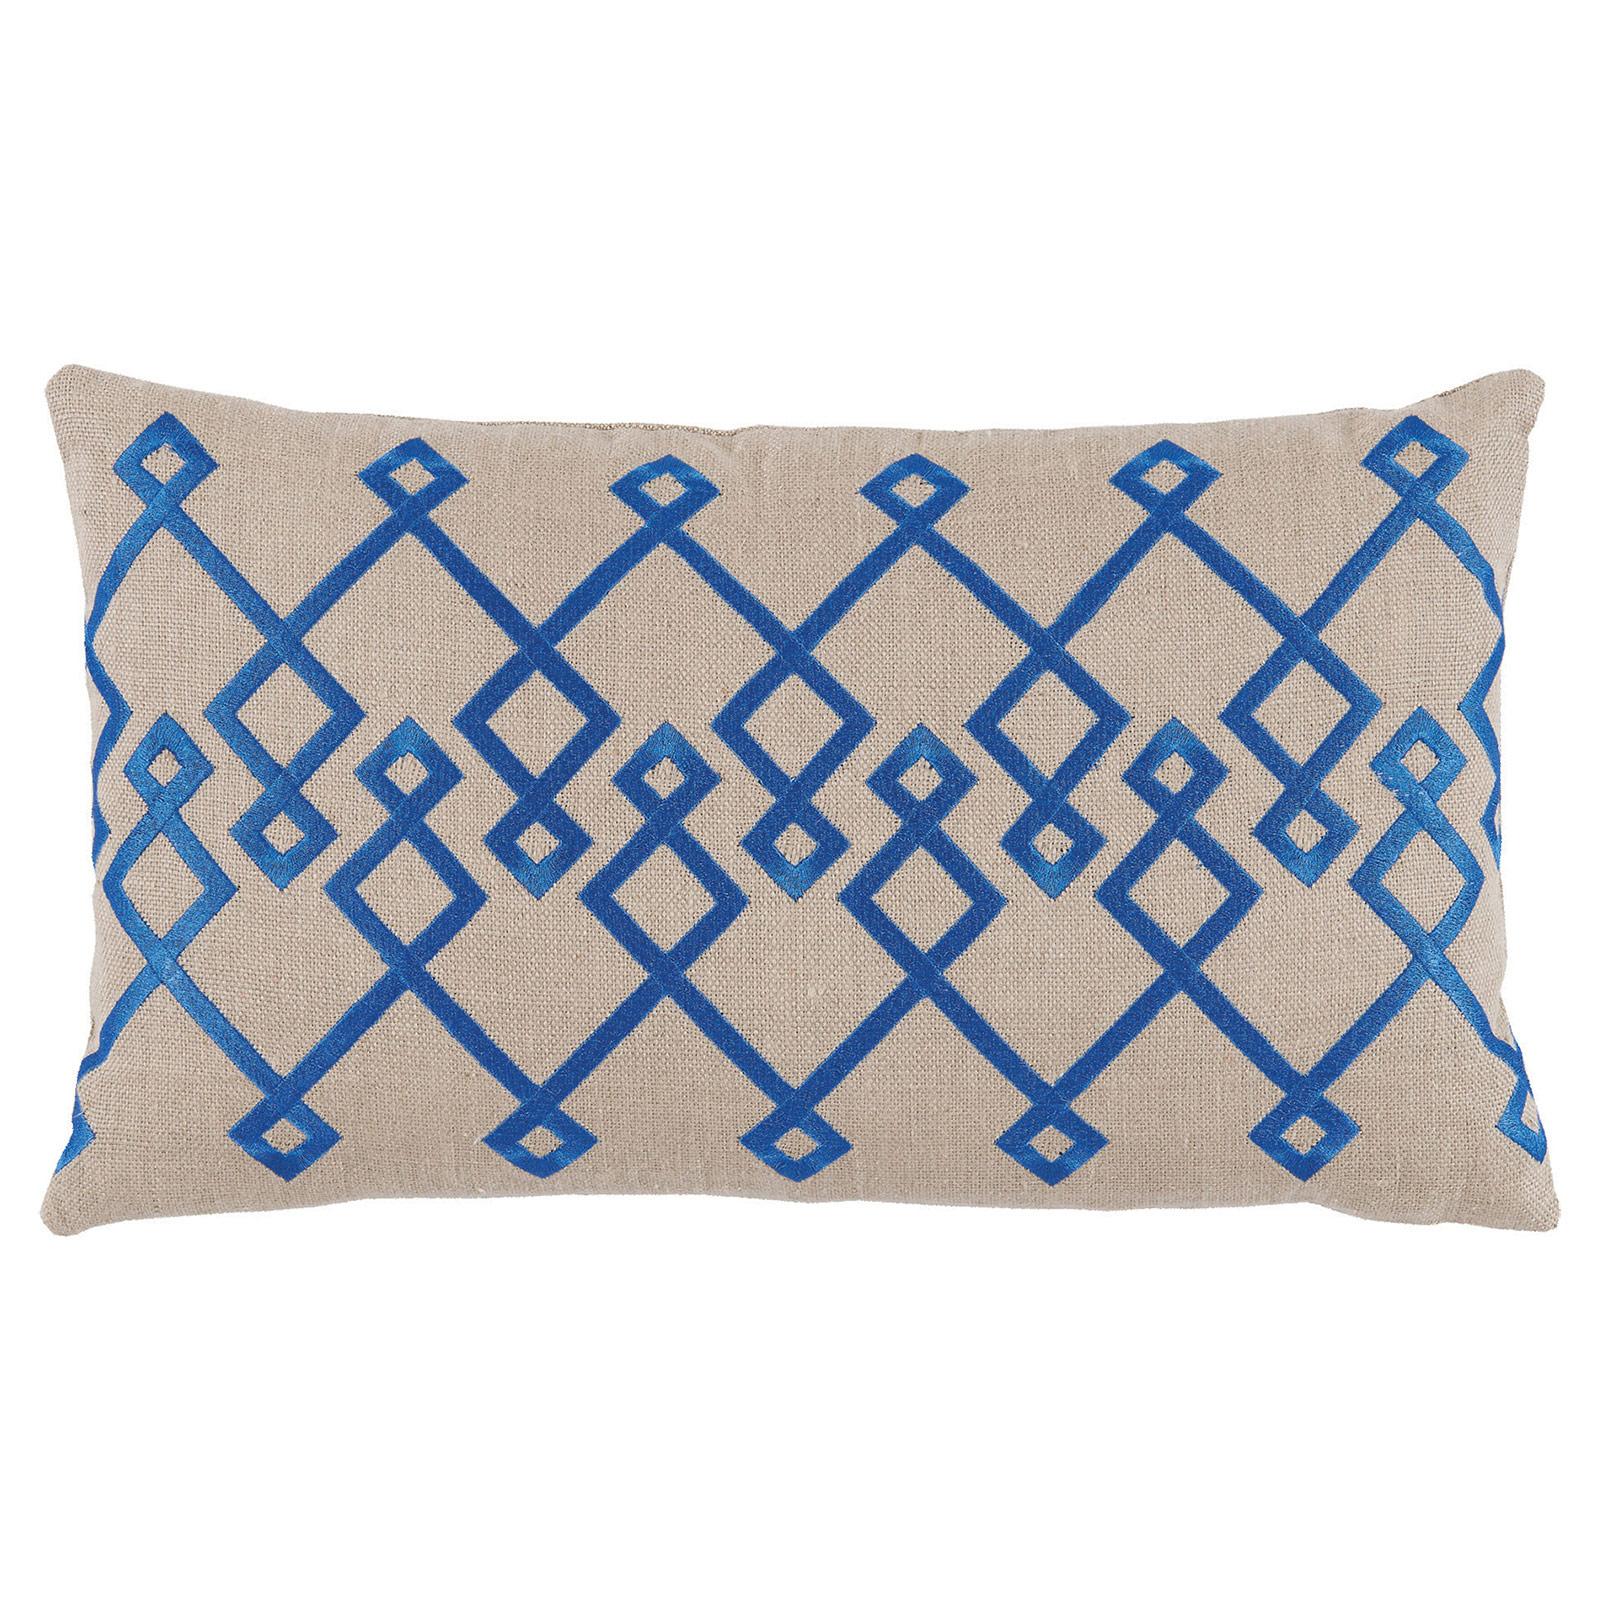 Steph Modern Blue Chevron Stitch Beige Pillow - 13x22